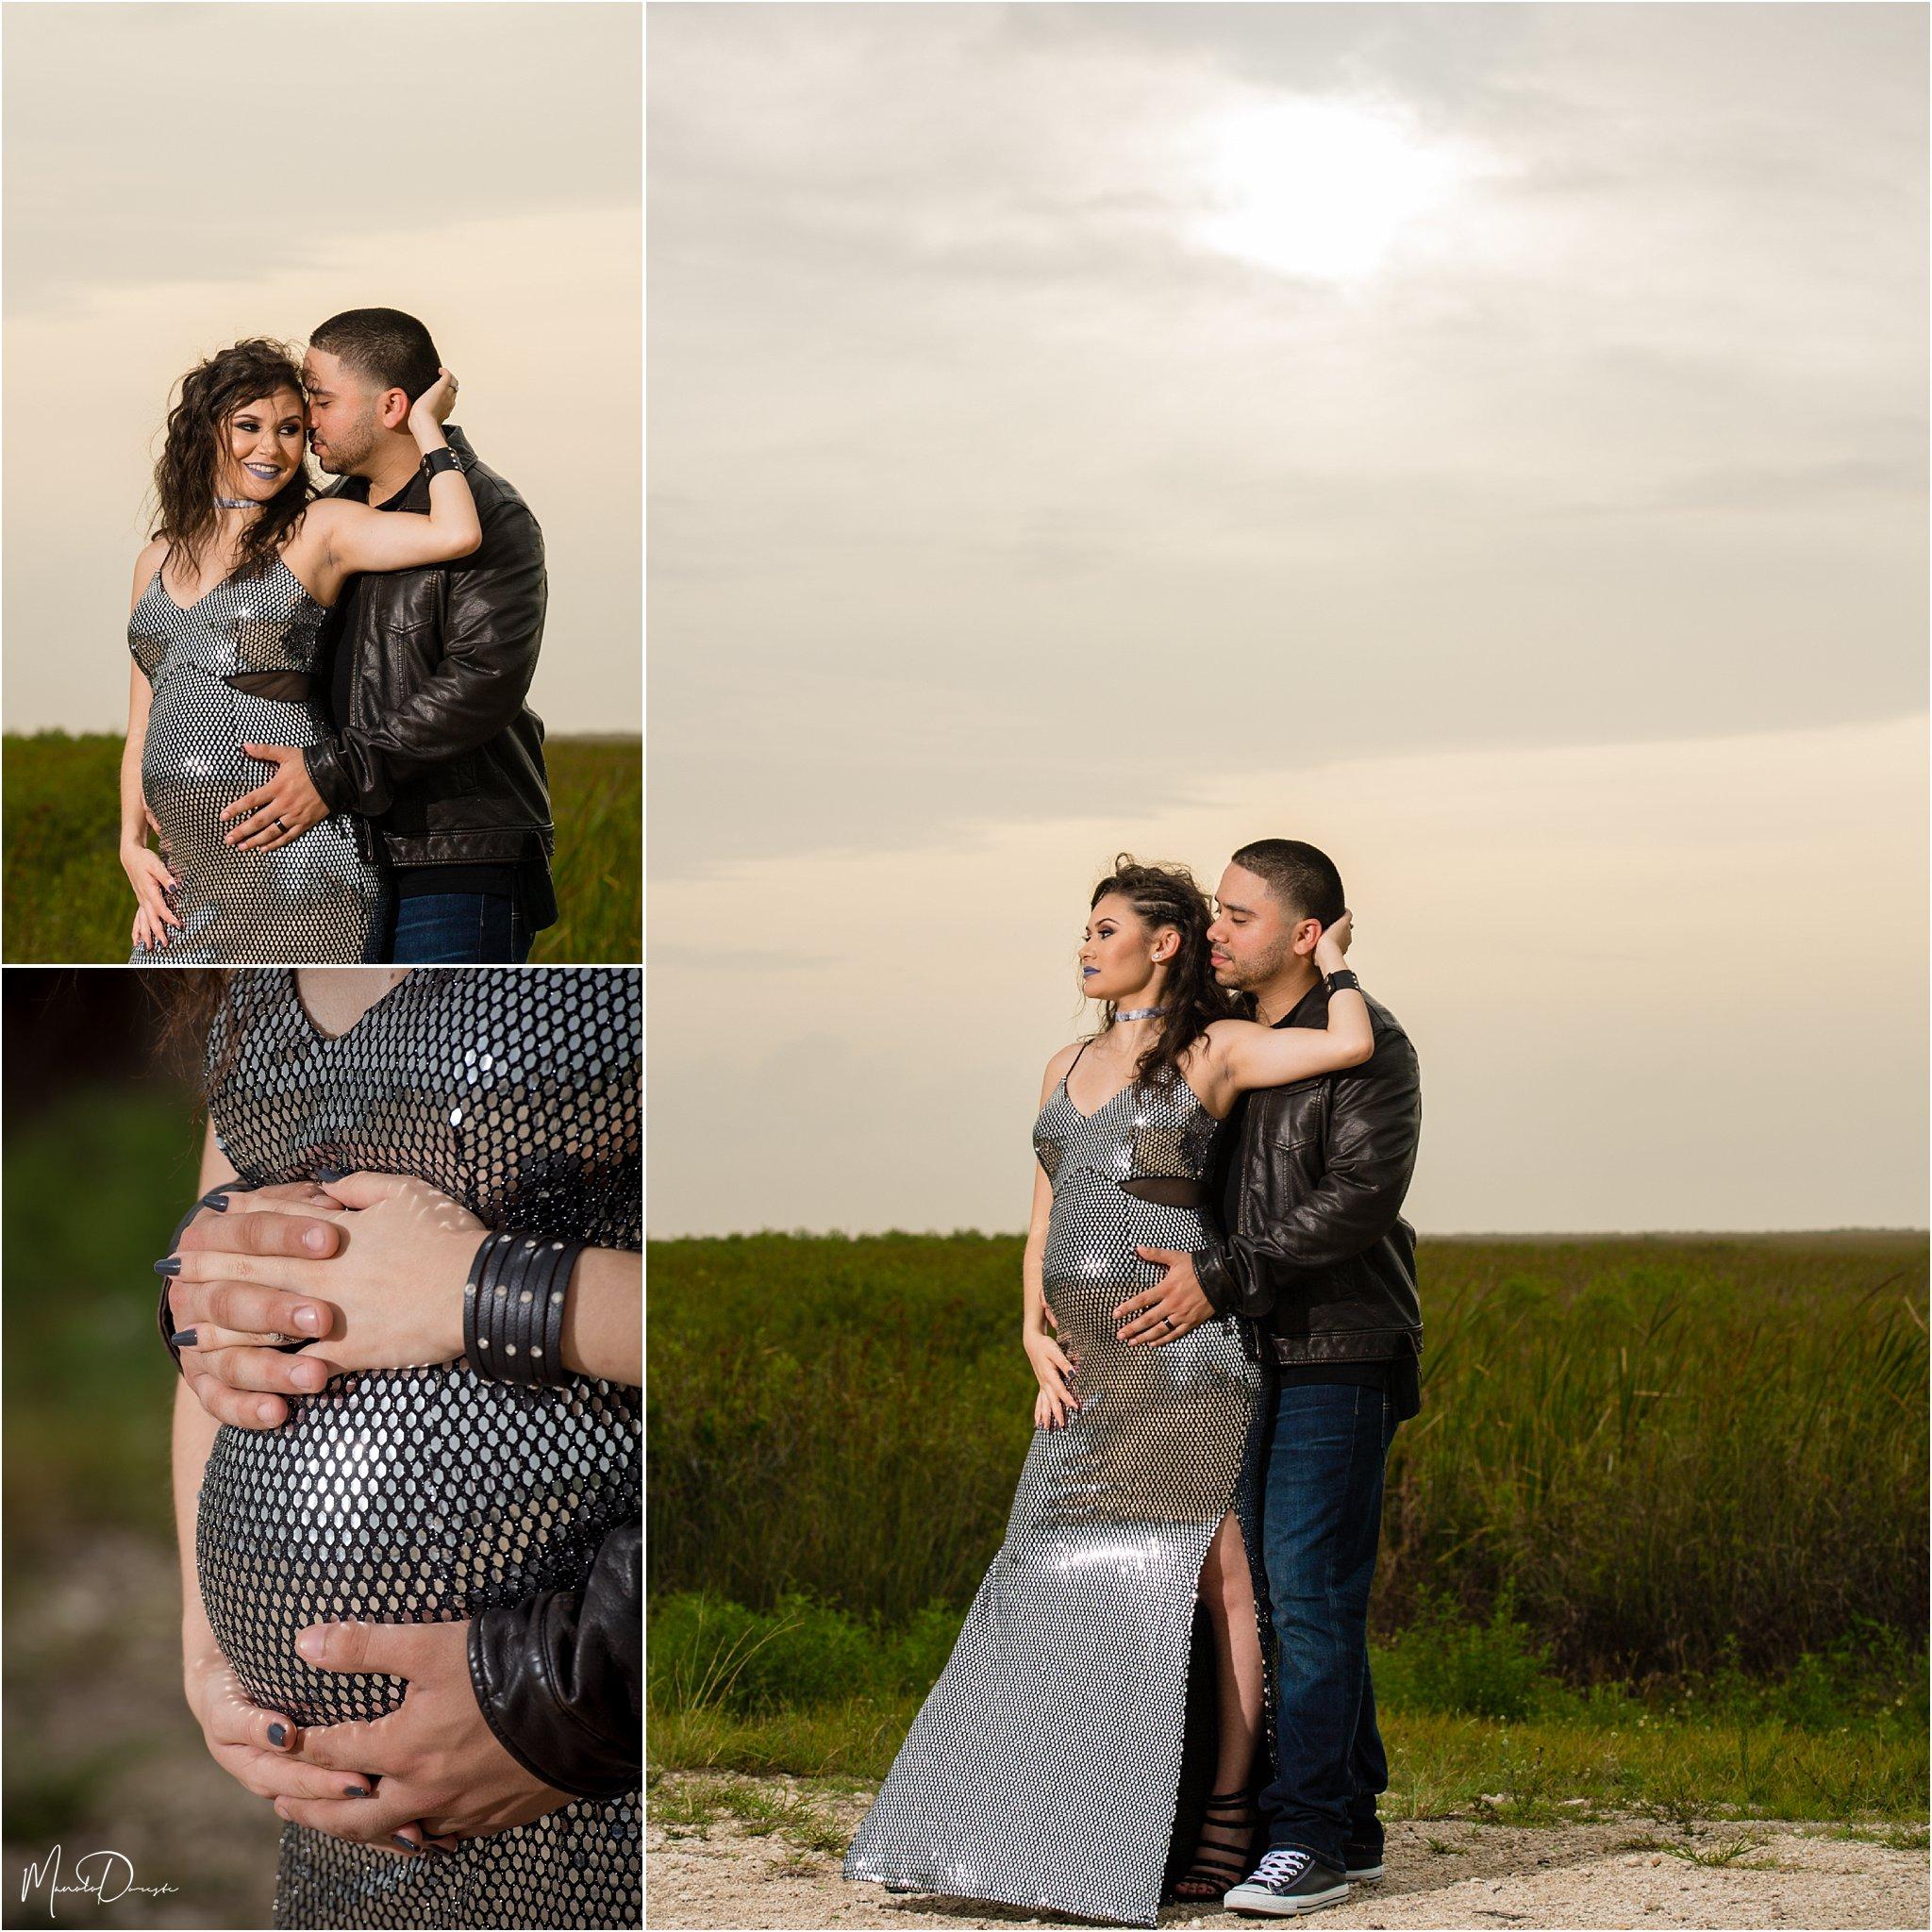 0413_ManoloDoreste_InFocusStudios_Wedding_Family_Photography_Miami_MiamiPhotographer.jpg